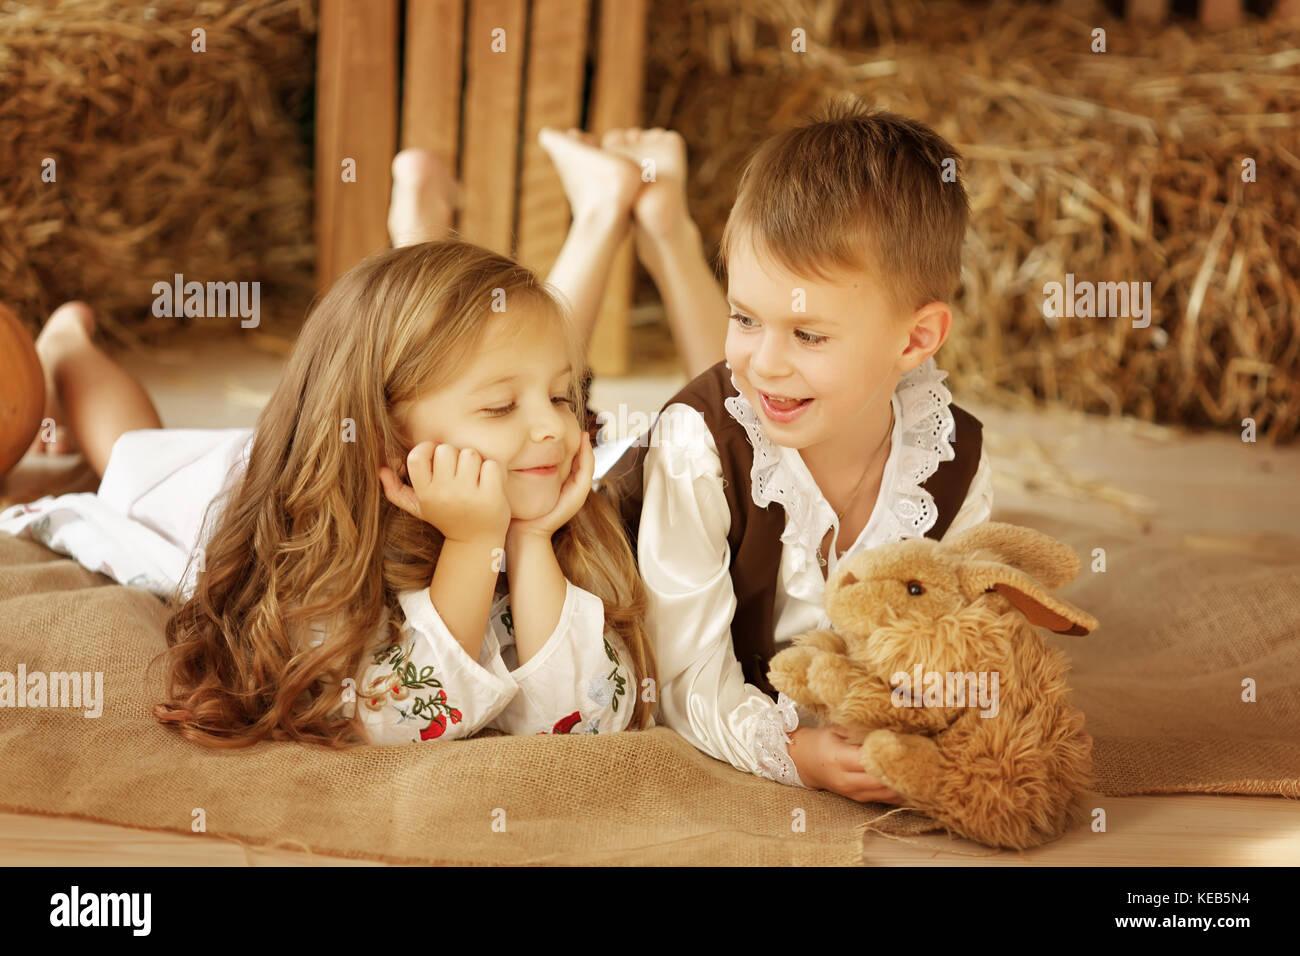 European Boy And Girl Togetherlove Story Stock Photo 163744480 Alamy